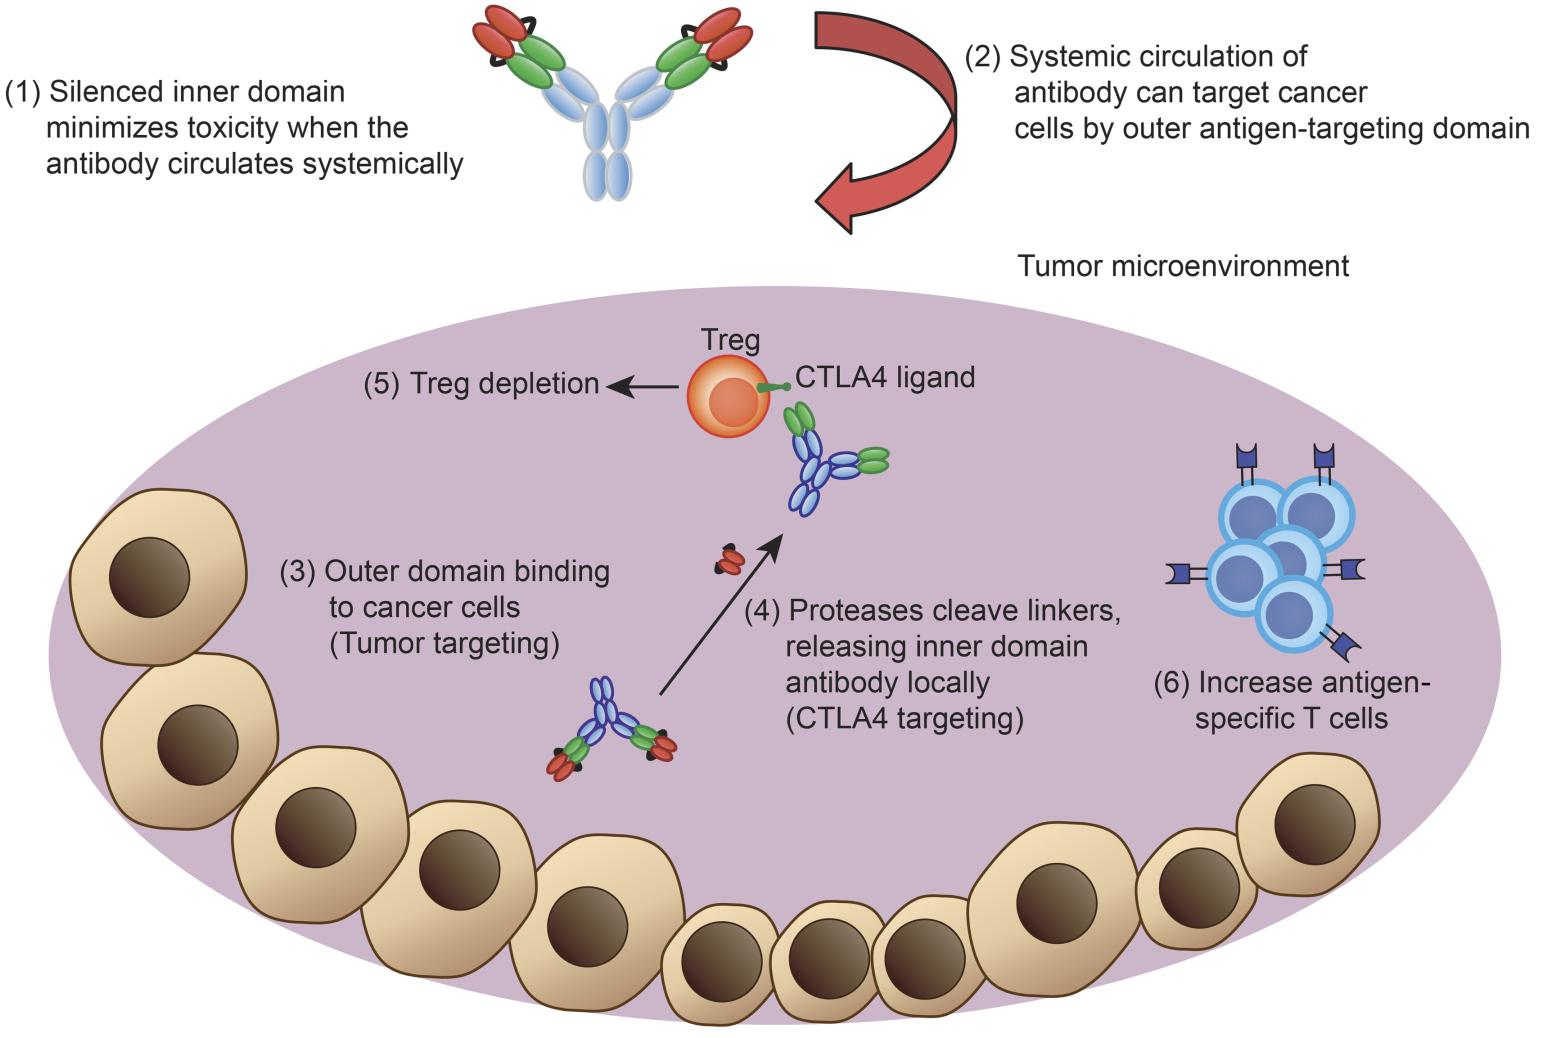 JCI - Tumor-conditional anti-CTLA4 uncouples antitumor efficacy from